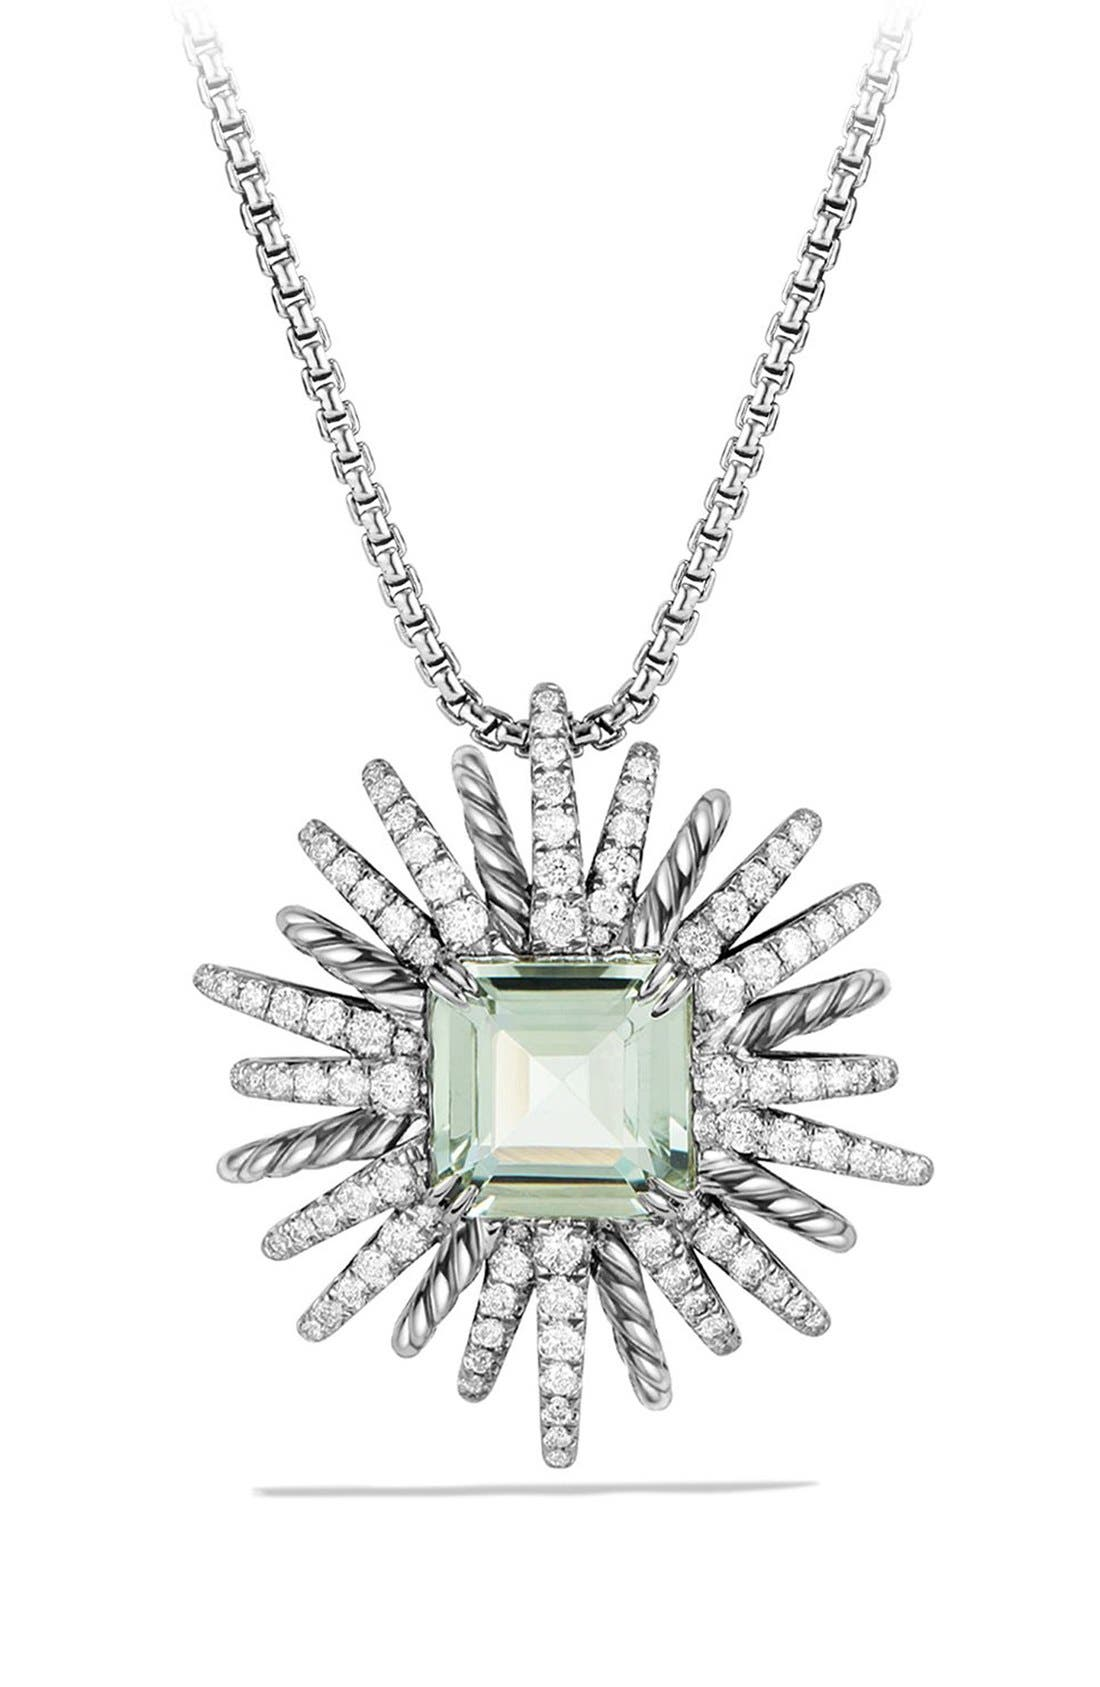 Main Image - David Yurman 'Starburst' Necklace with Diamonds in Silver